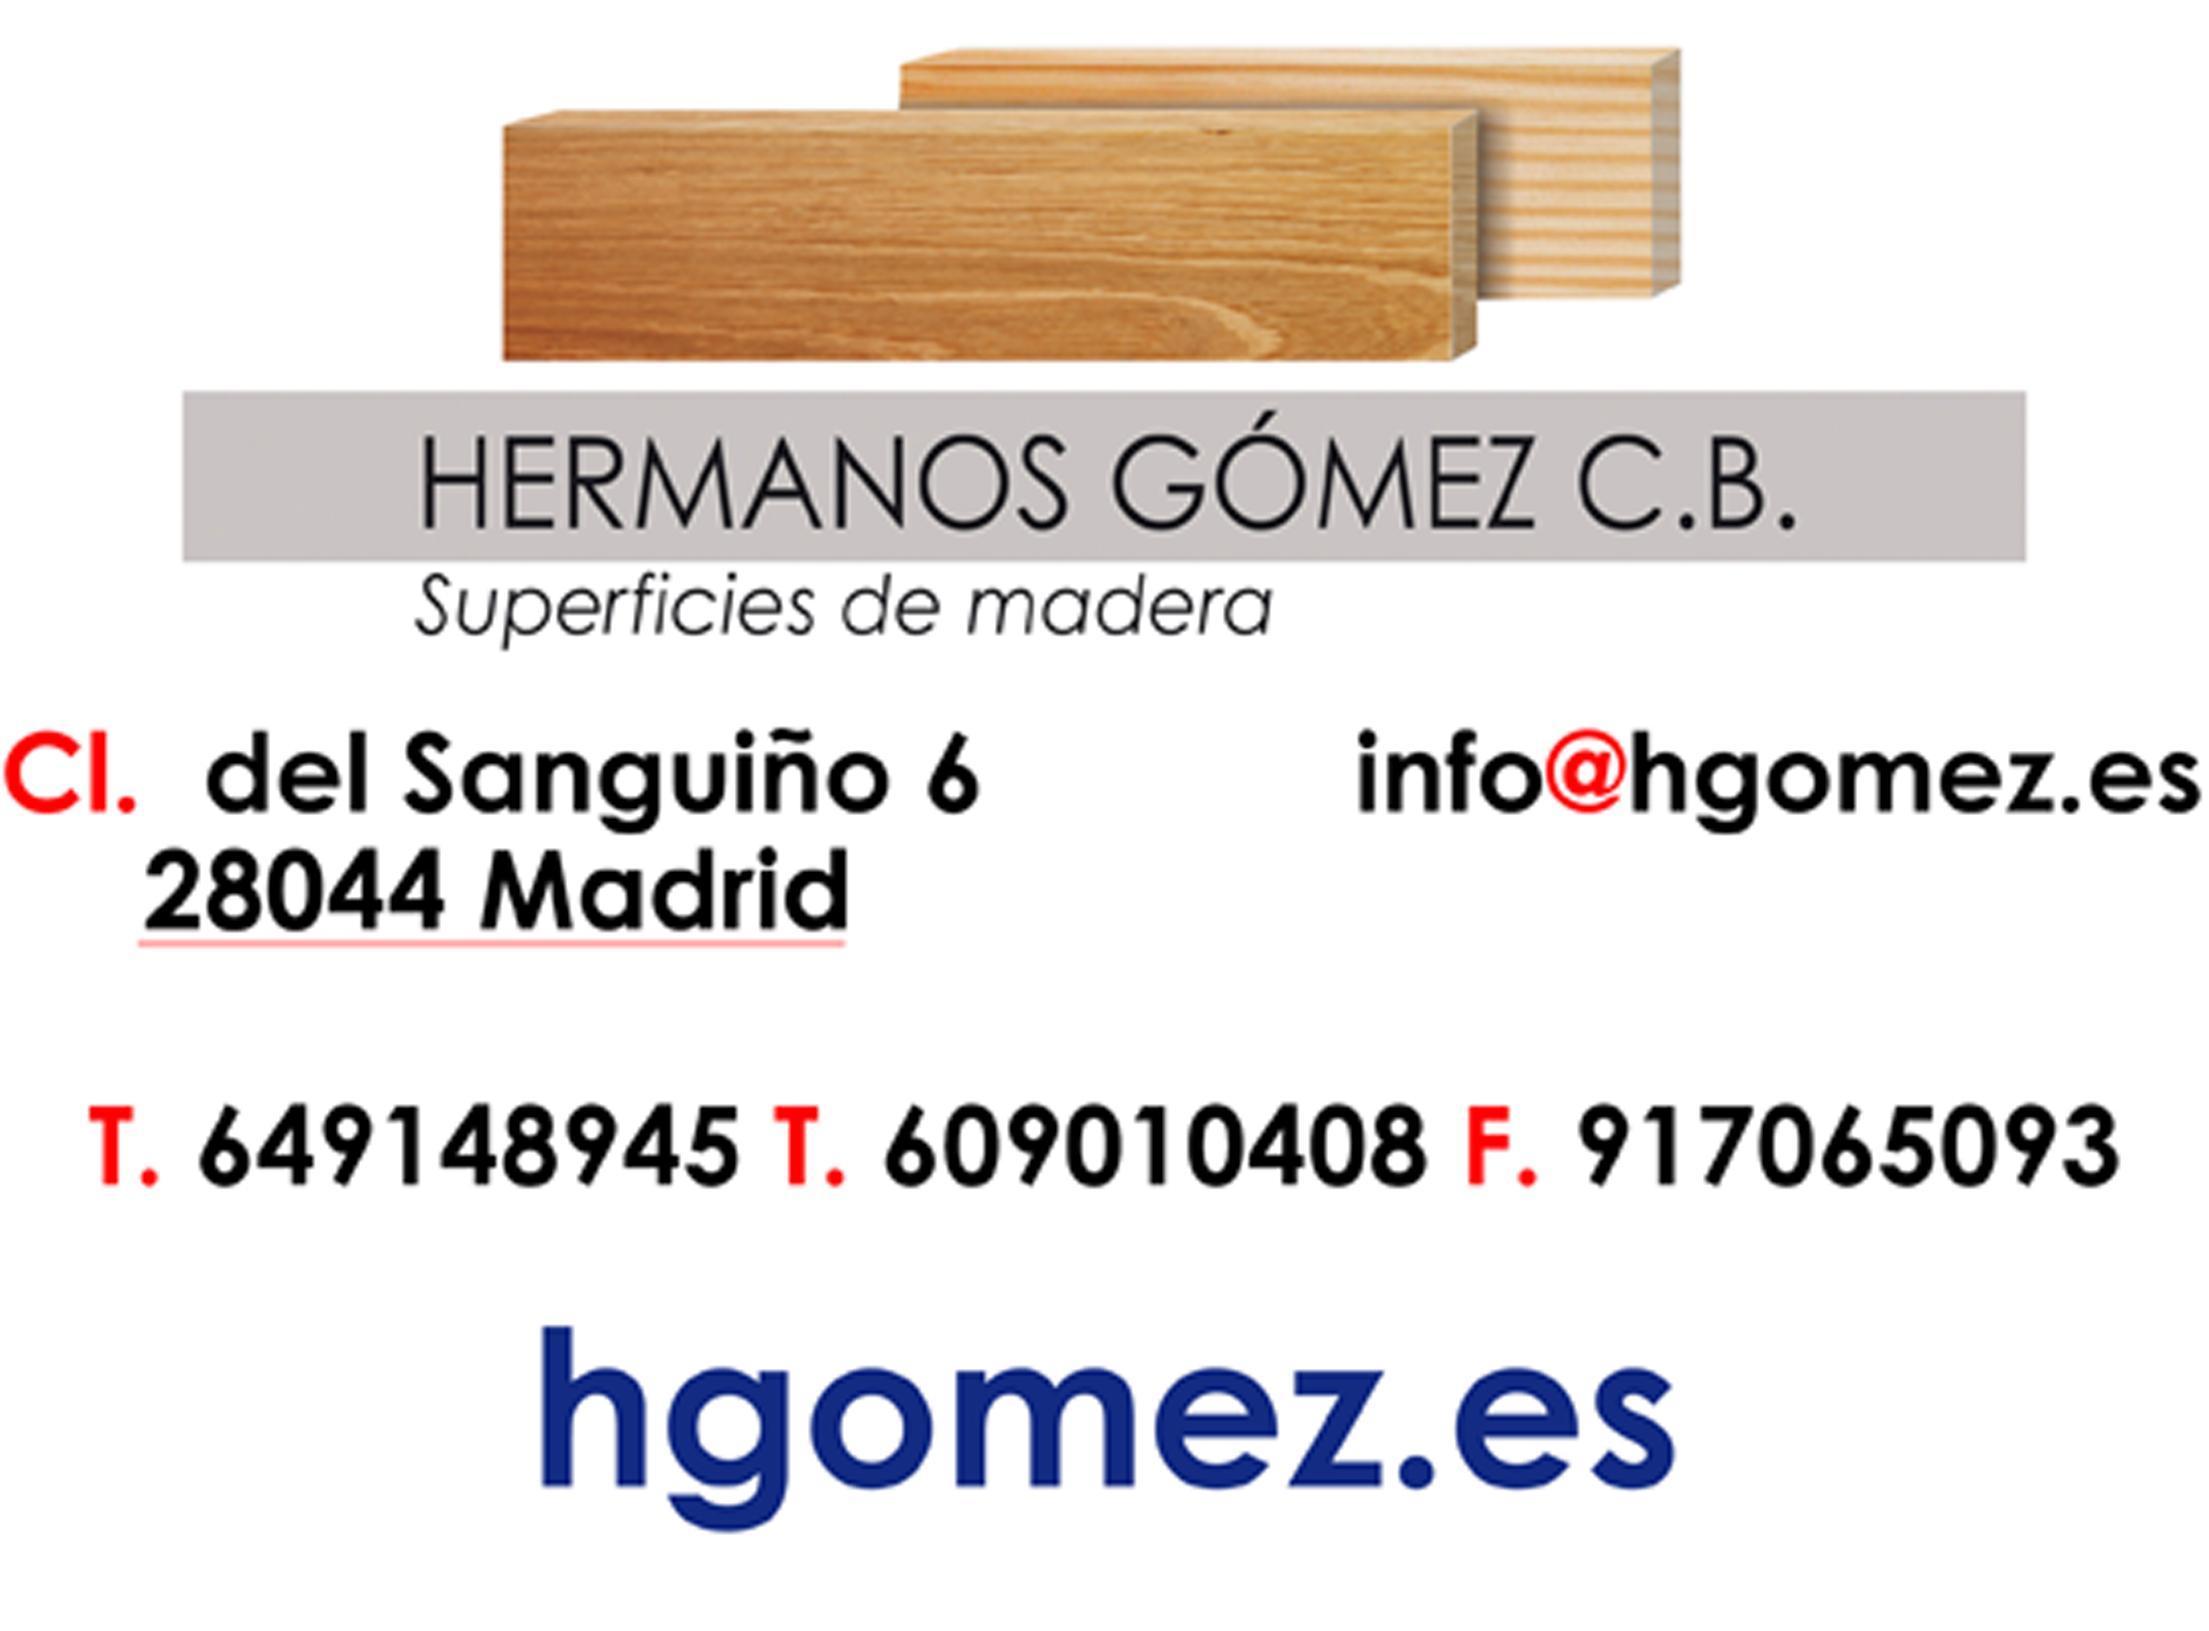 Hermanos Gómez C.B.